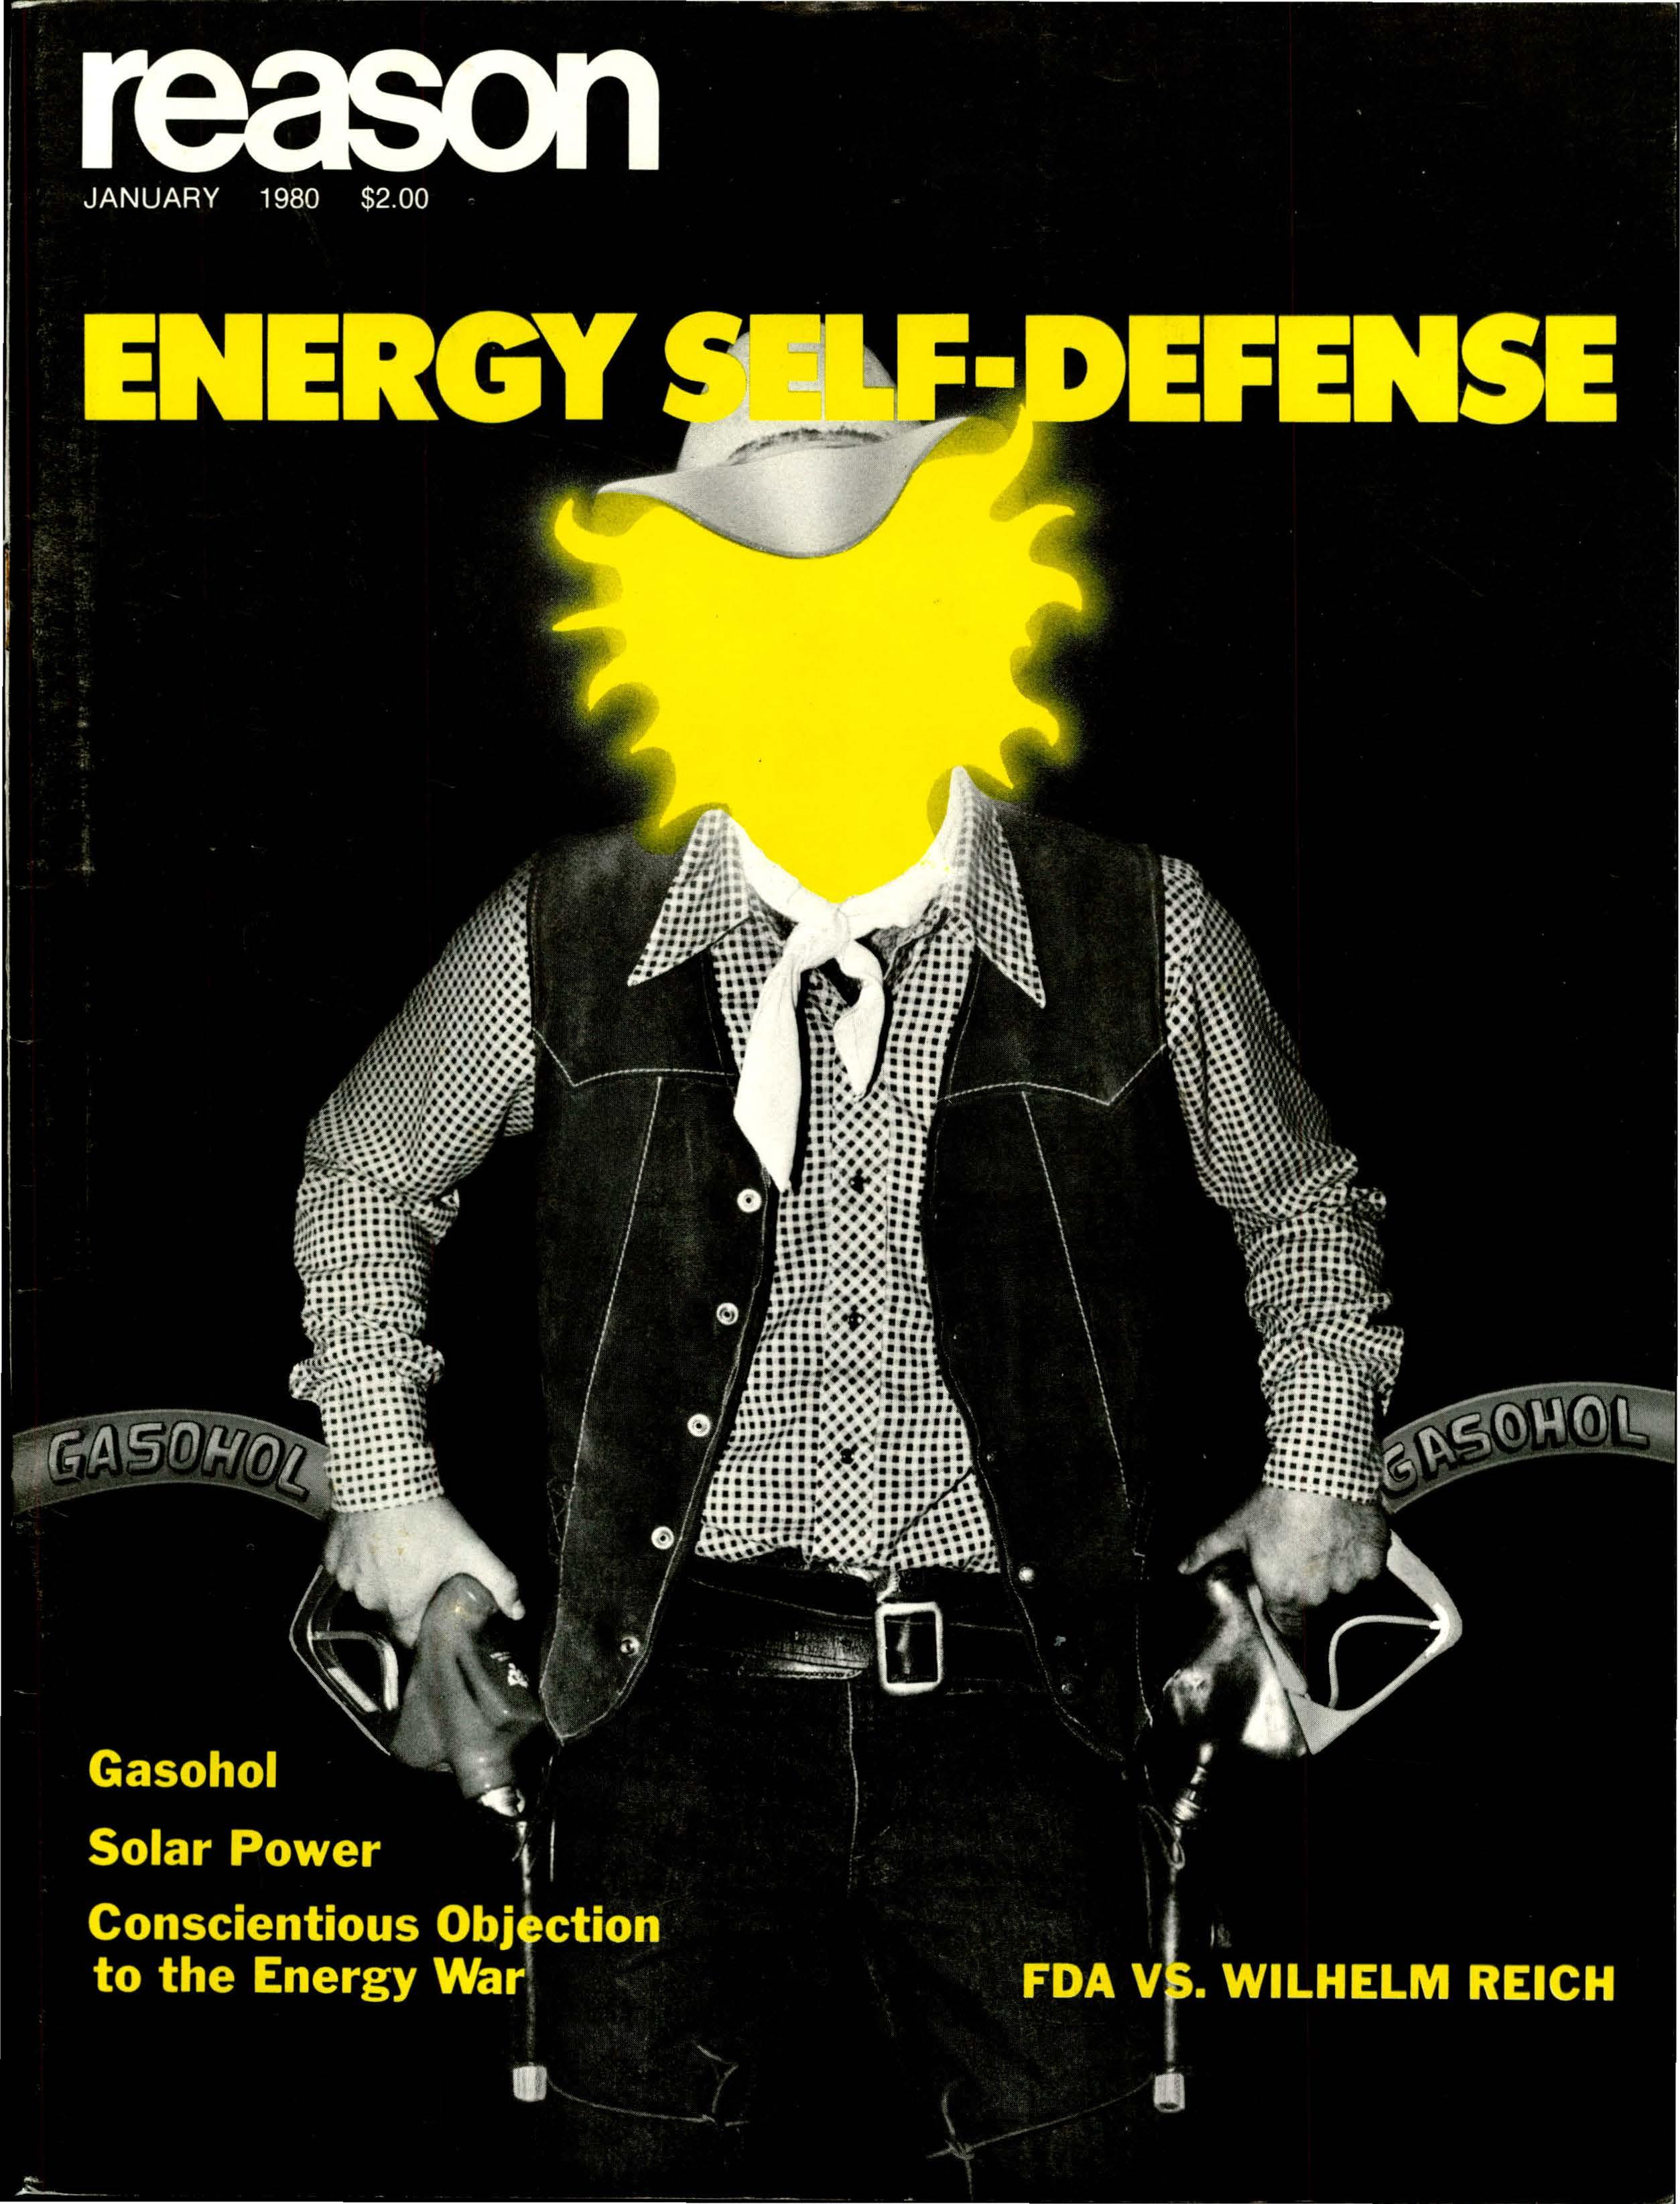 Reason Magazine, January 1980 cover image